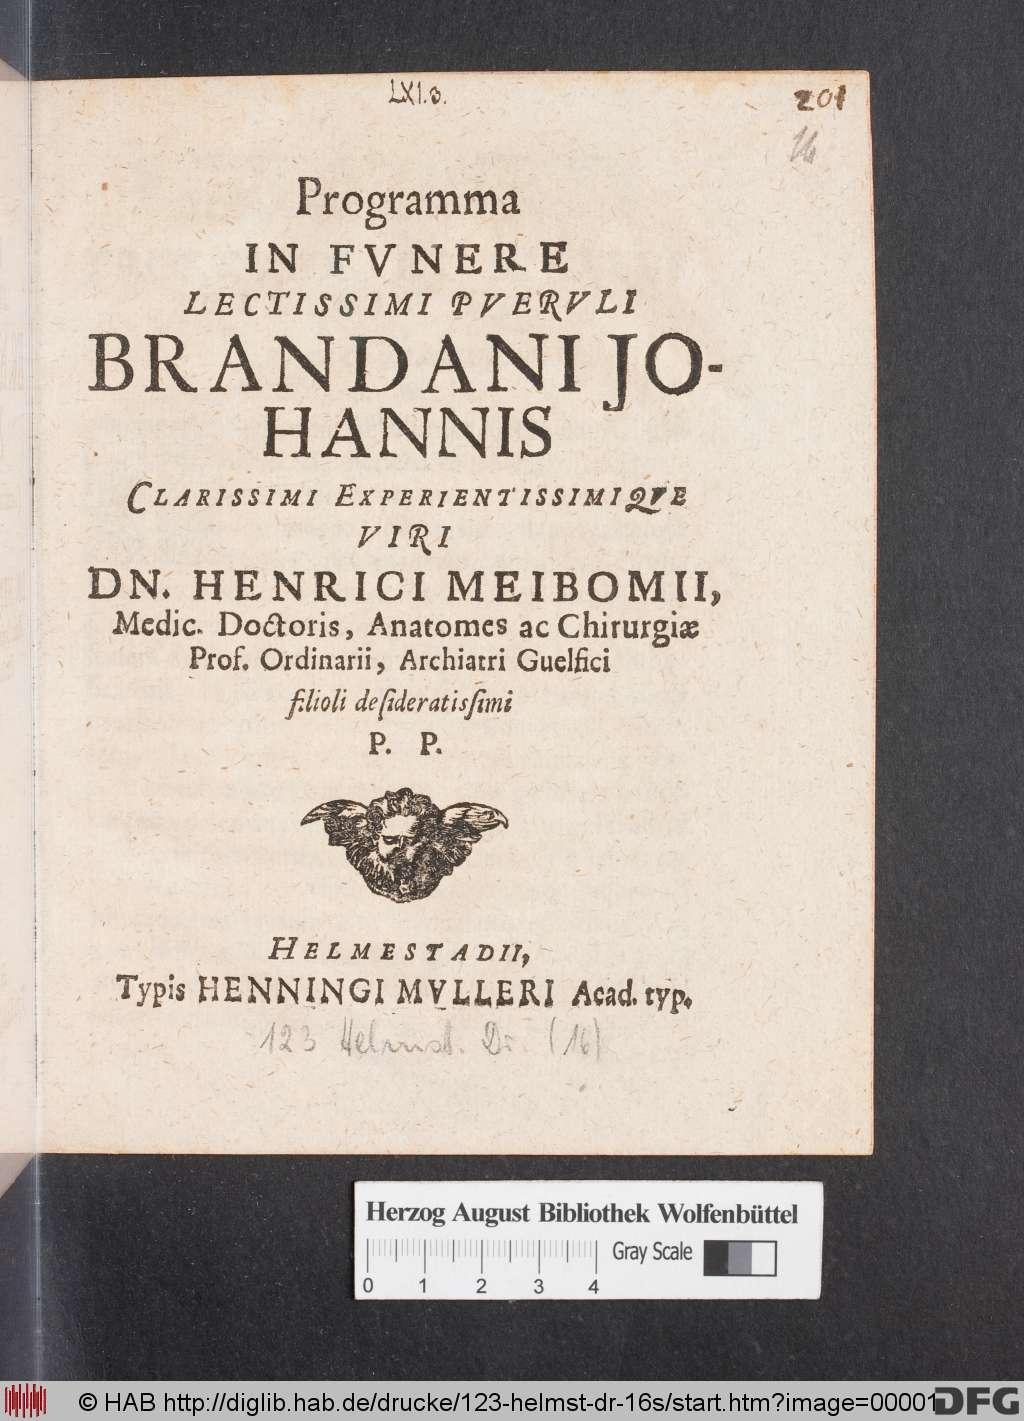 http://diglib.hab.de/drucke/123-helmst-dr-16s/00001.jpg